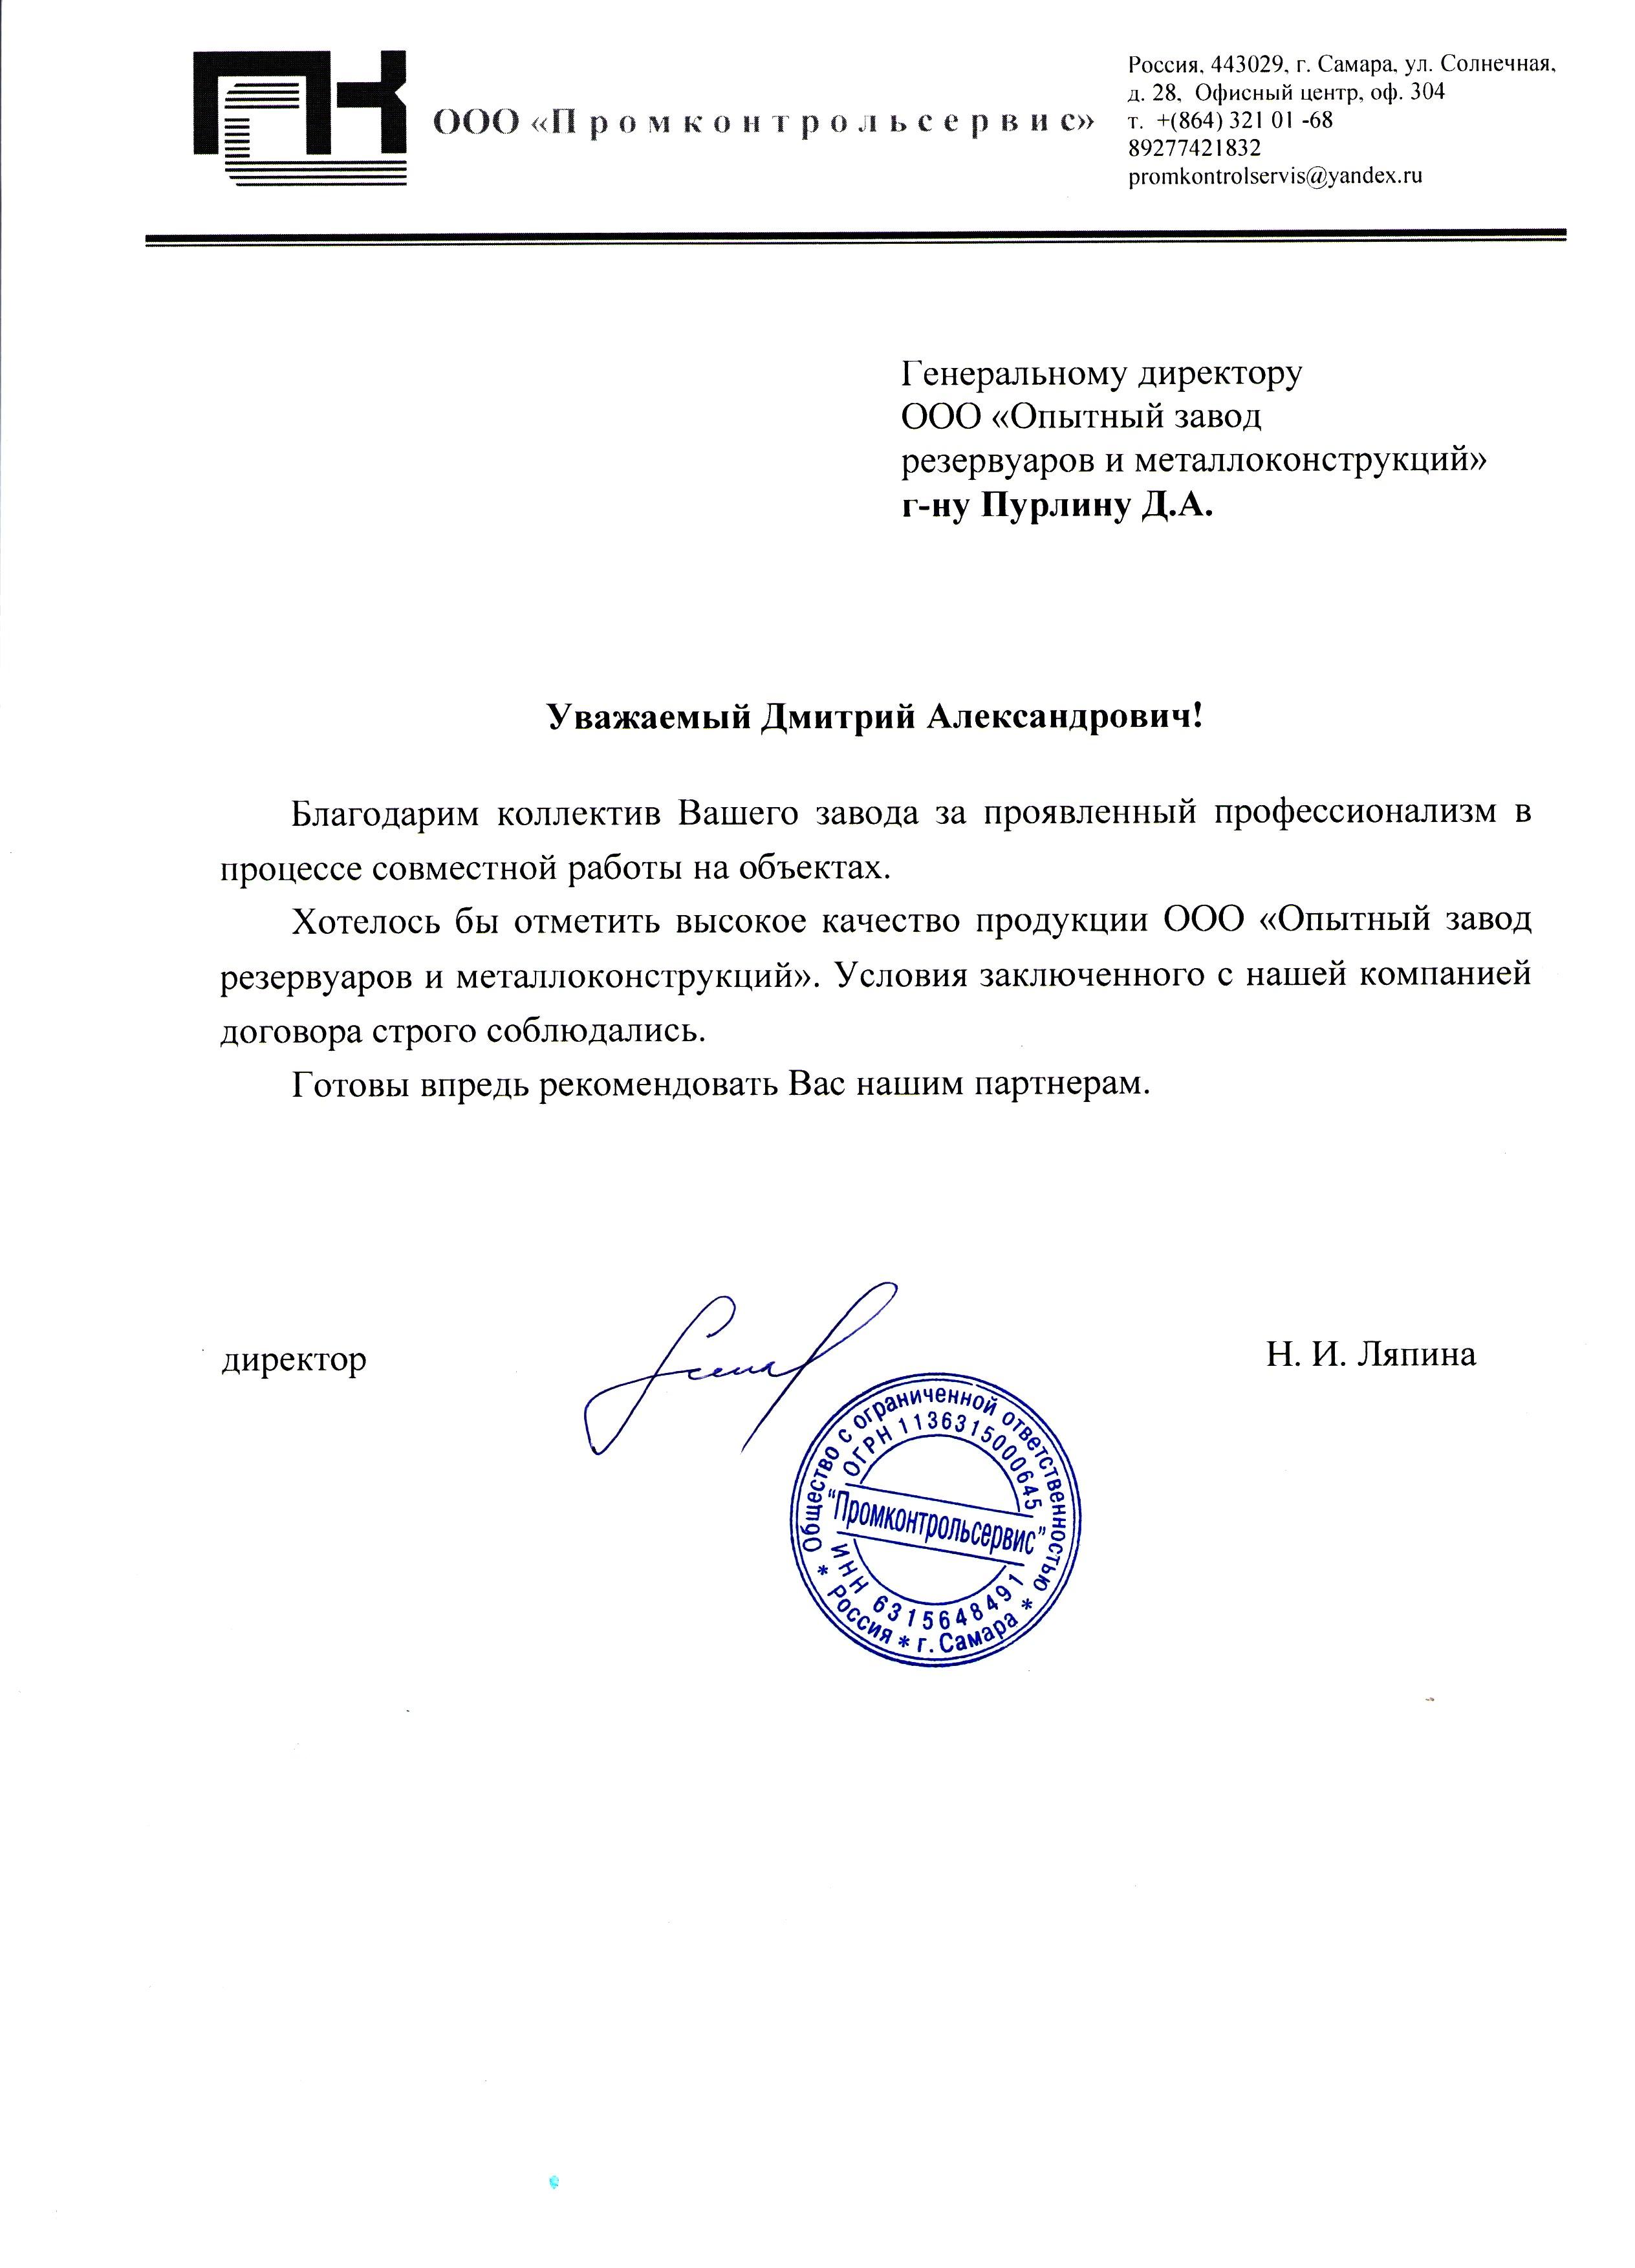 ОТЗЫВ ООО «Промконтрольсервис»